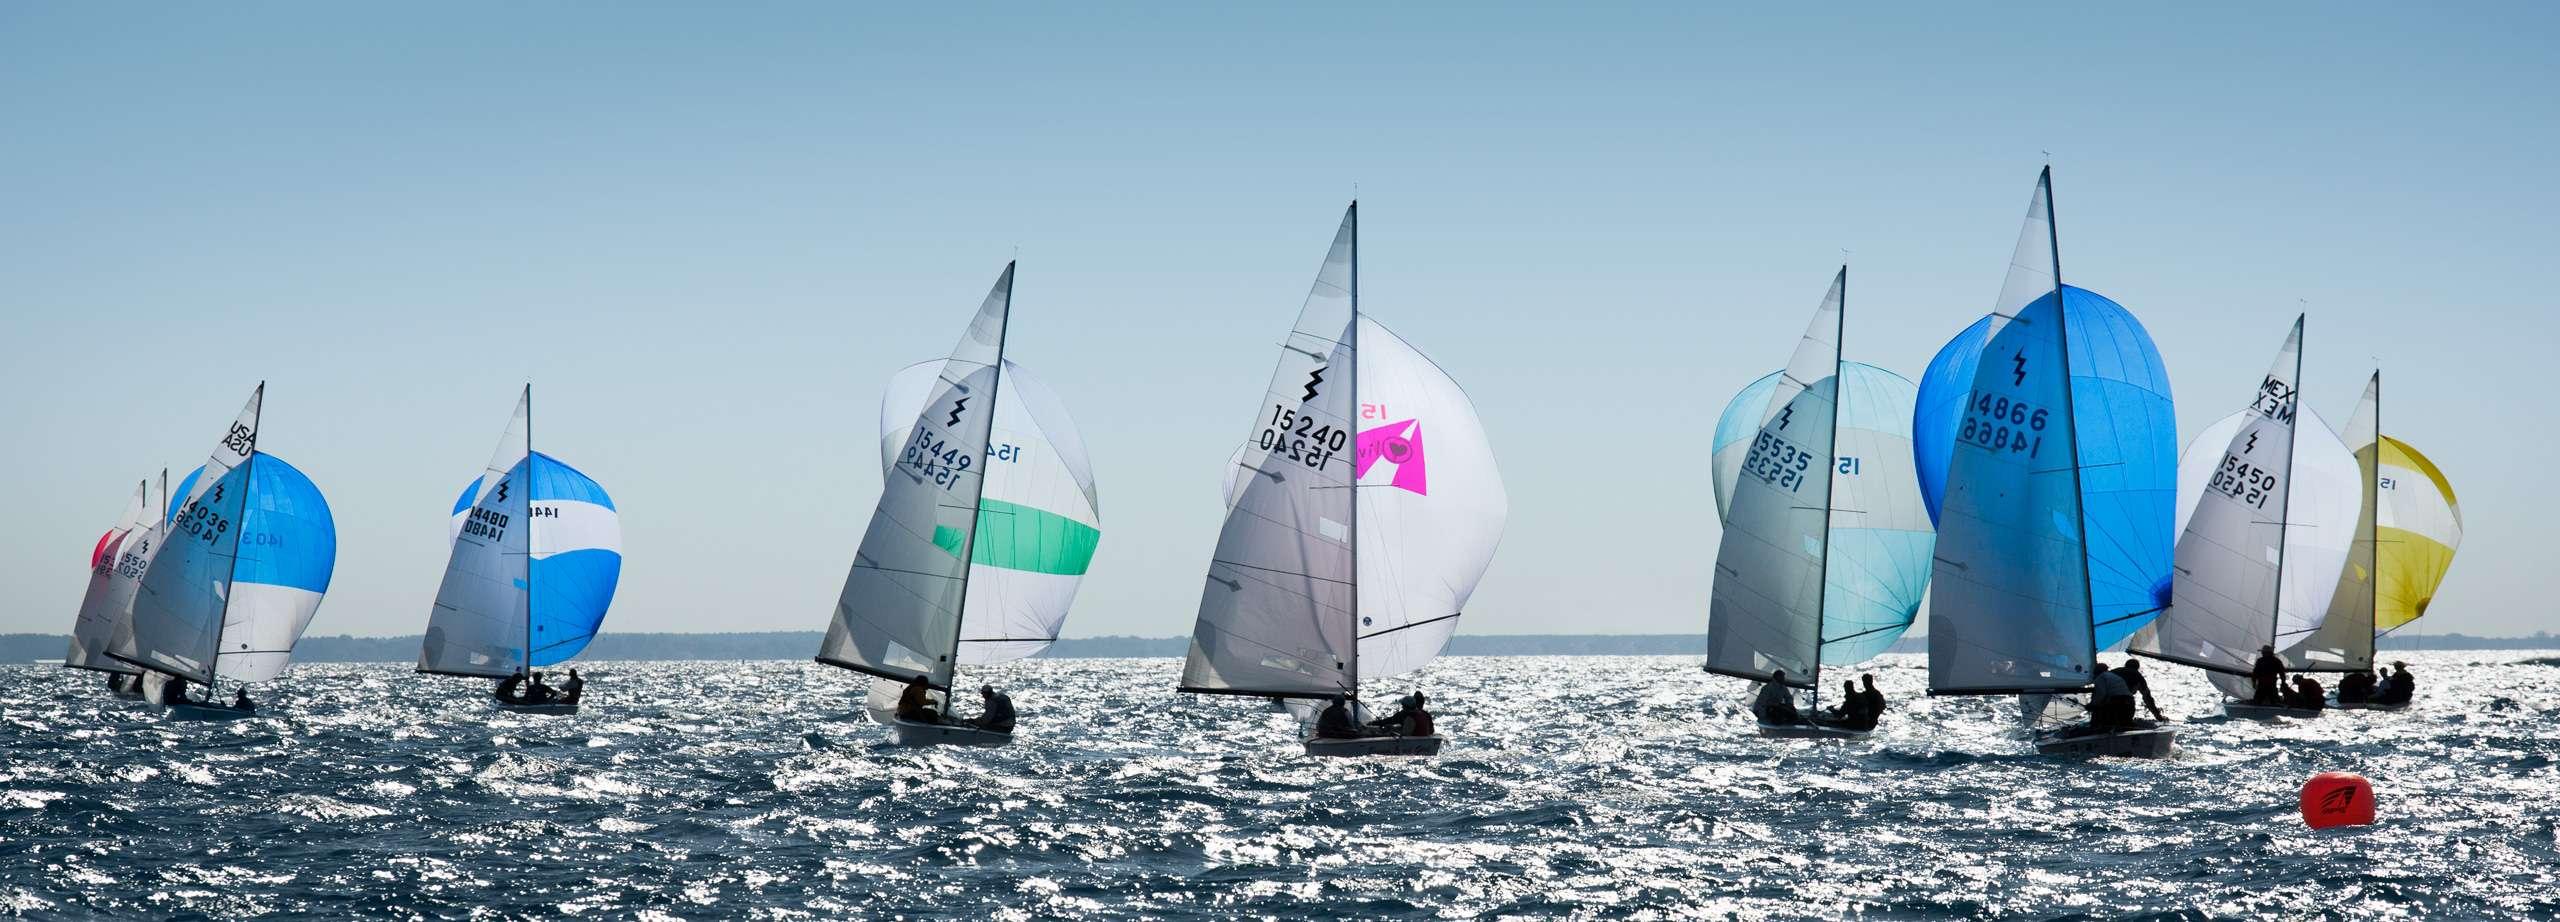 PORTFOLIO - Sailing - Chesapeake #5   PCG751